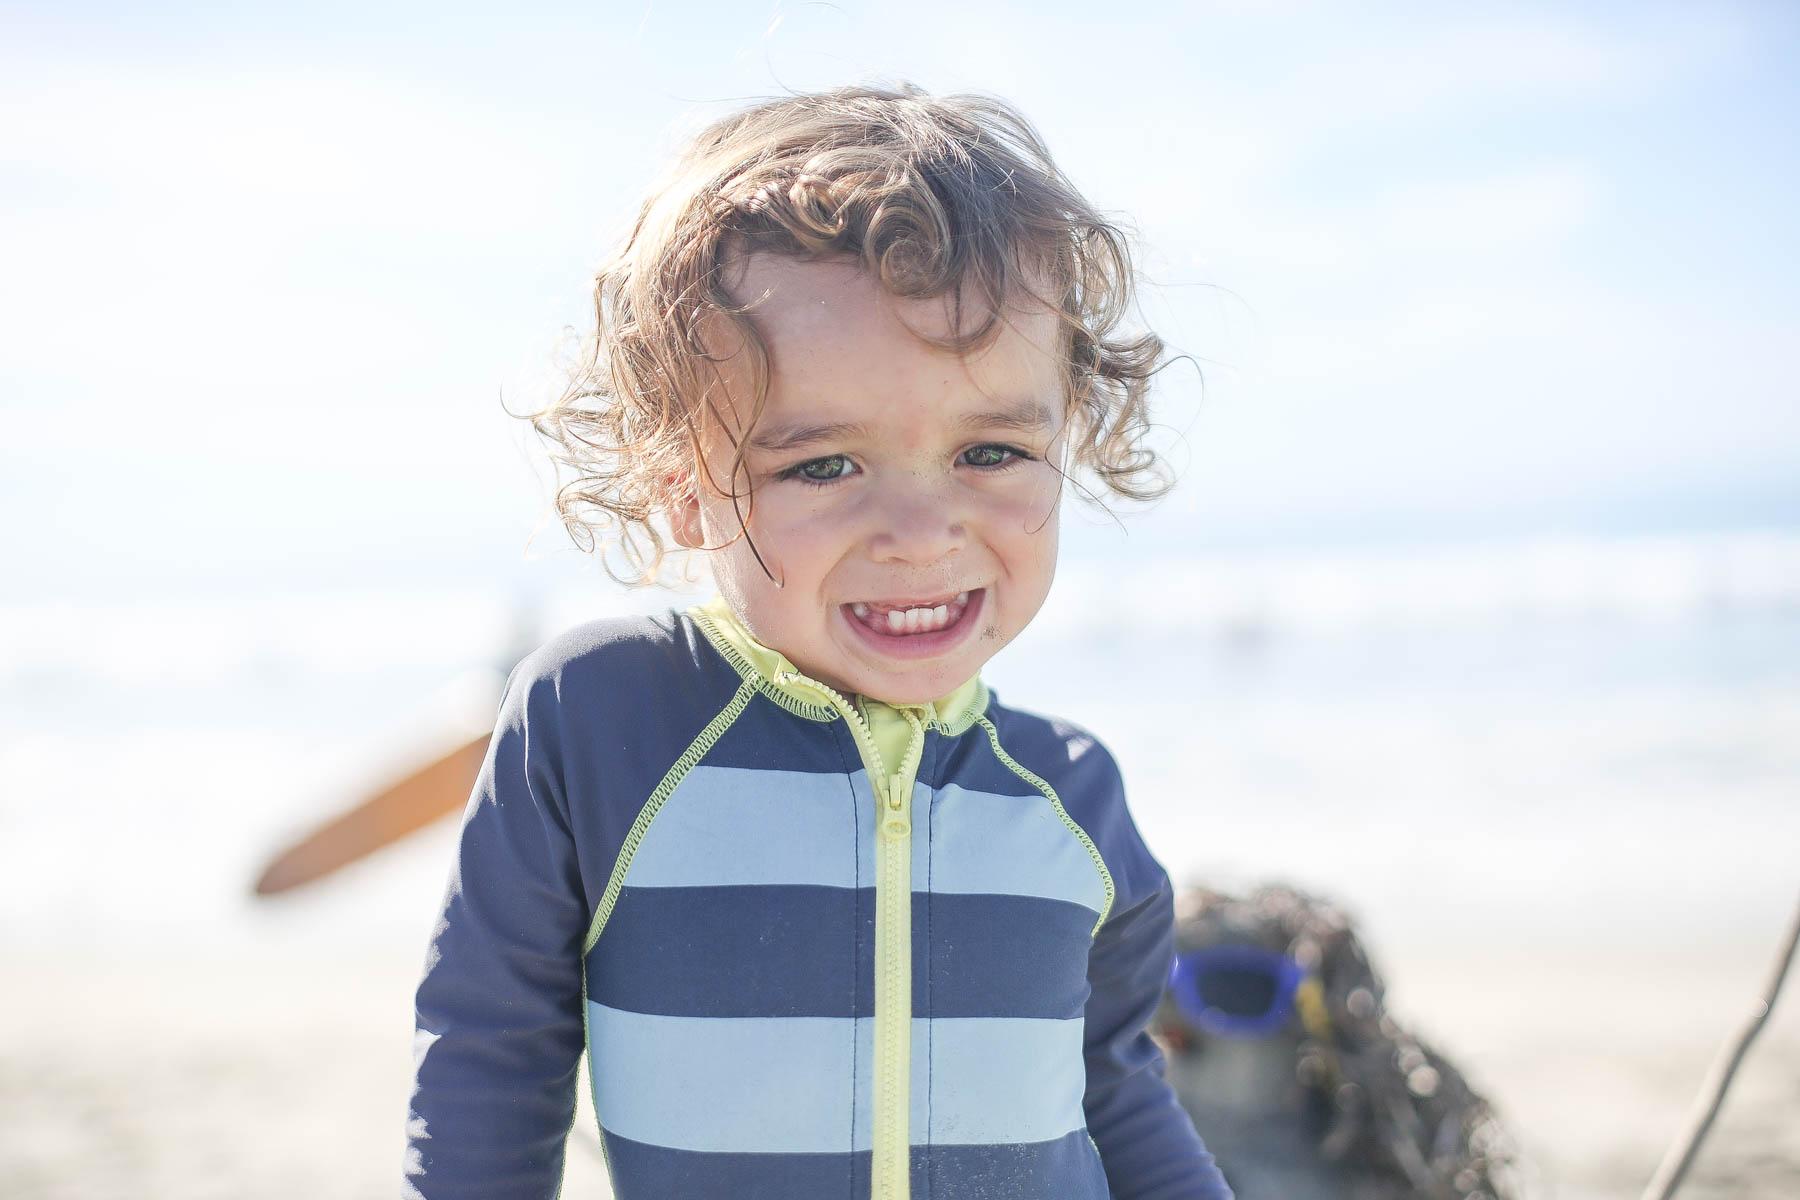 Smiing Kid #kids #summertips #summerparentingtips #citygirlgonemom